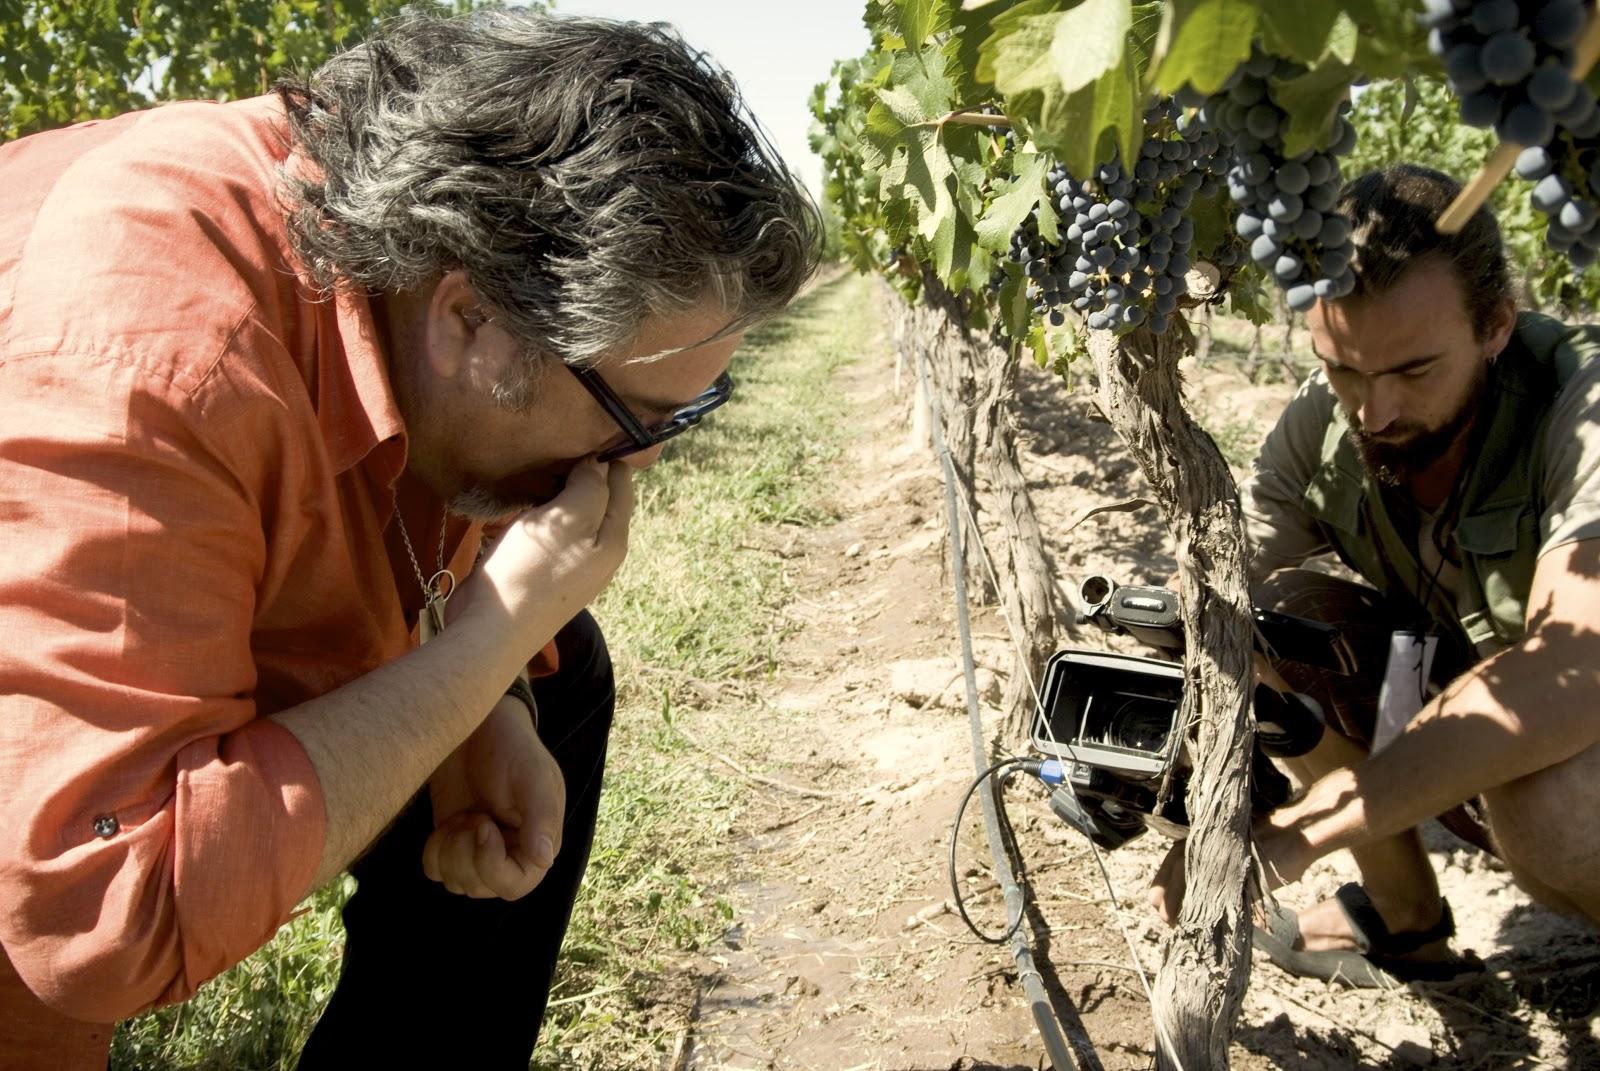 The Duel of Wine: Charlie Arturaola sul set del film